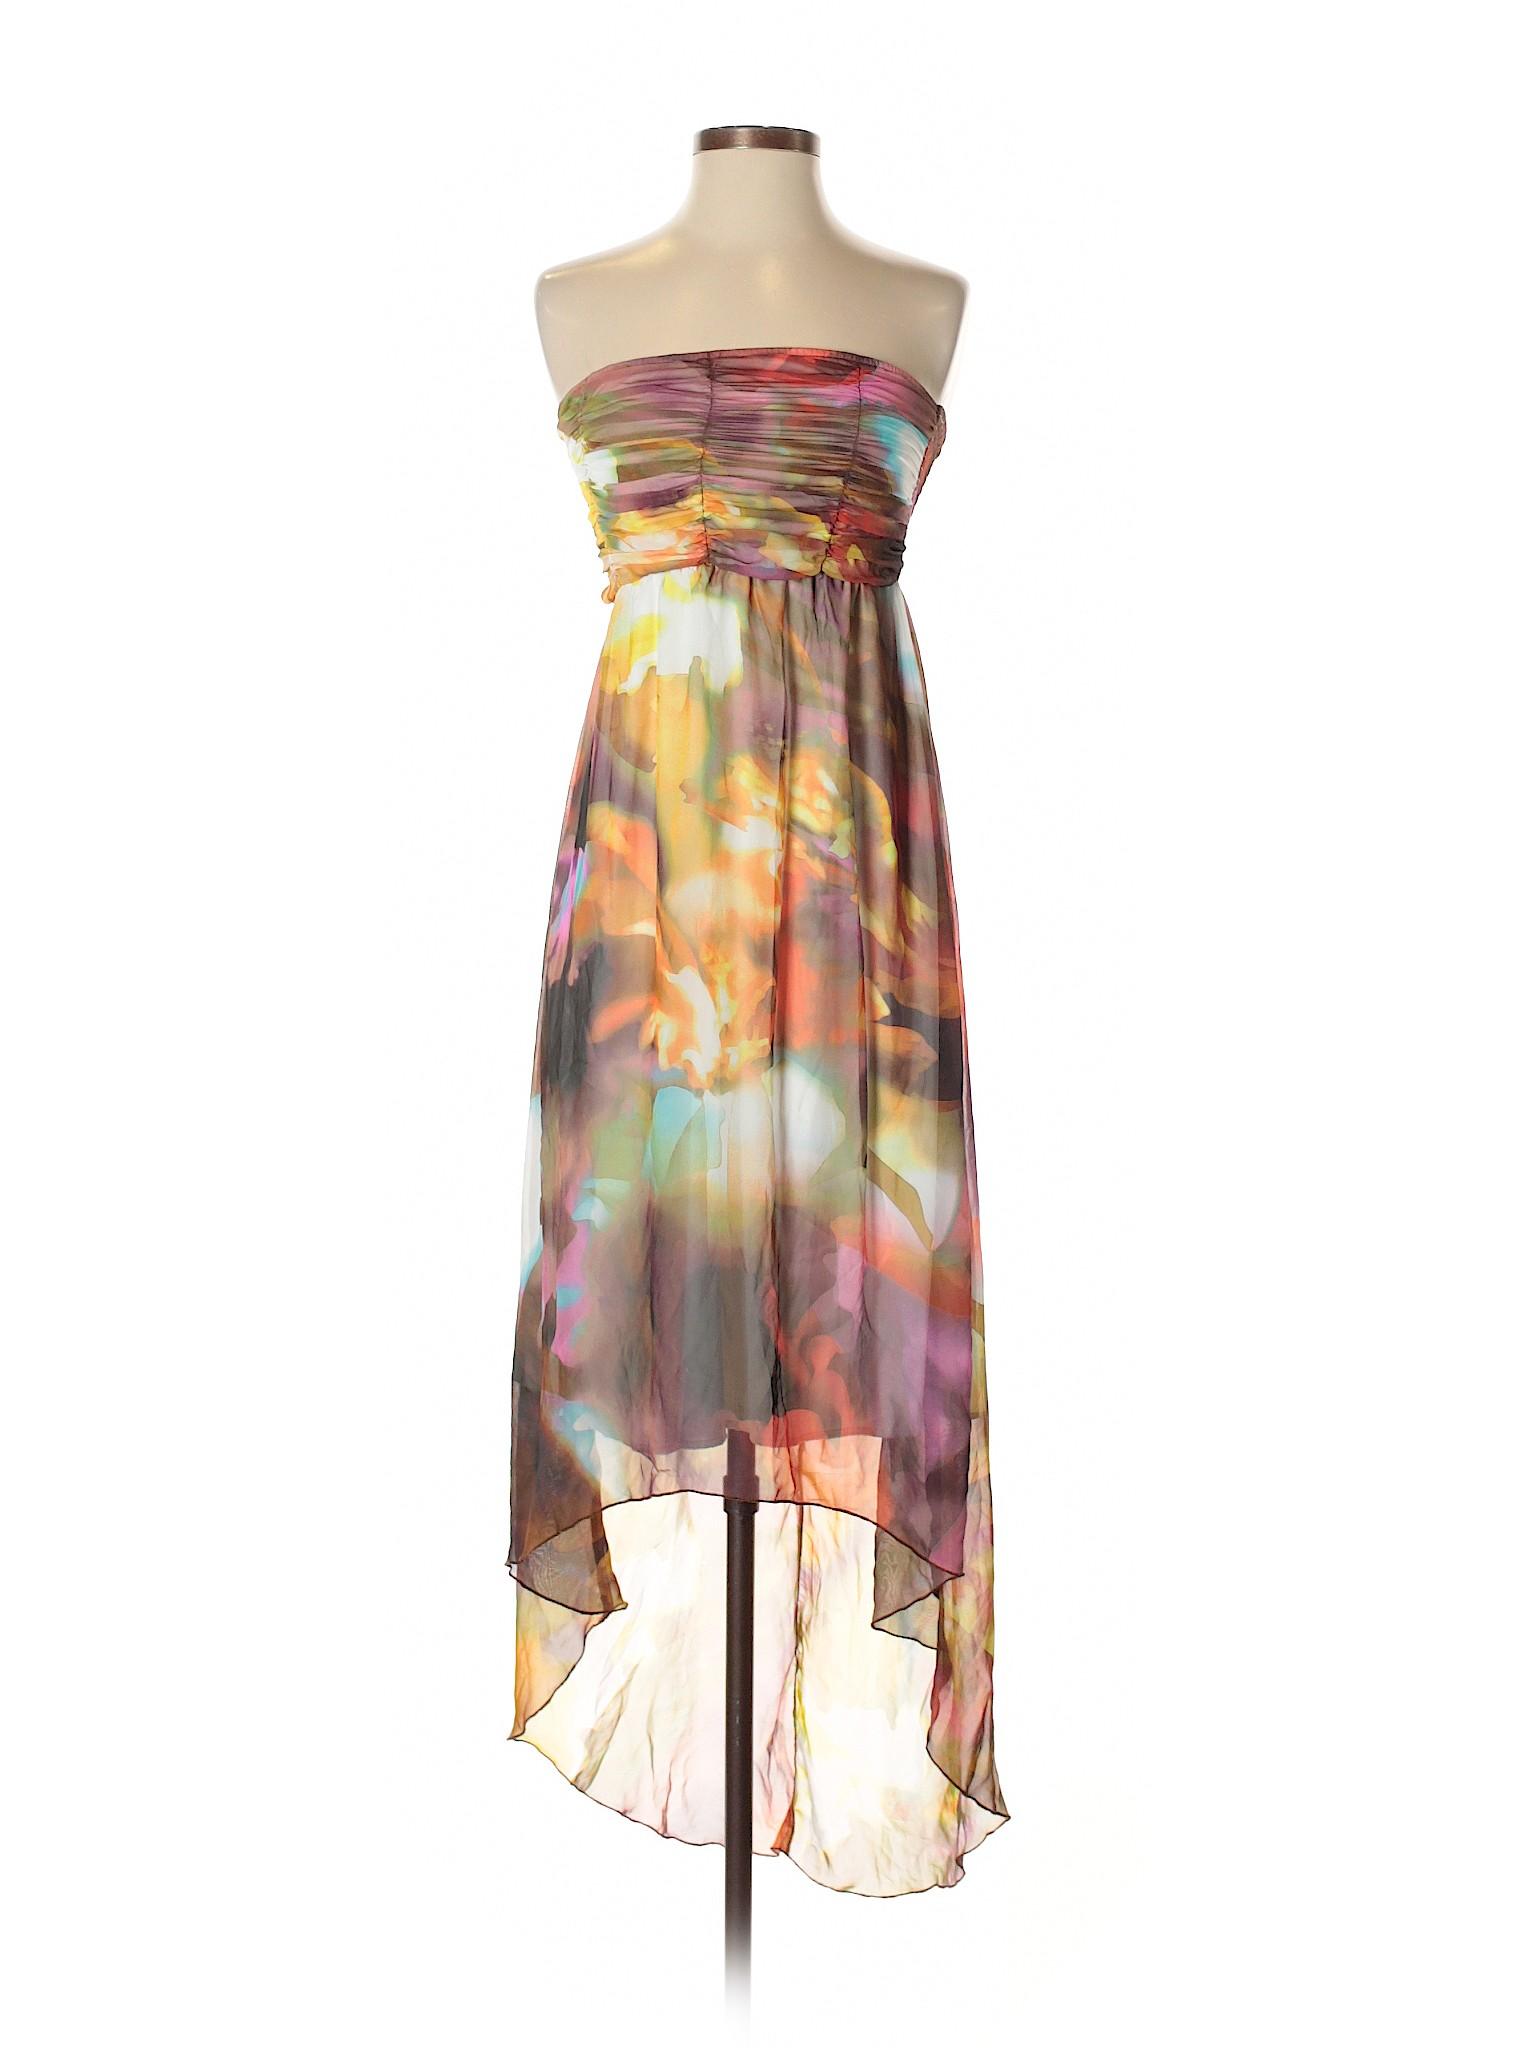 Selling Selling Studio Studio Casual Casual Y Dress Y Dress xqfvpA